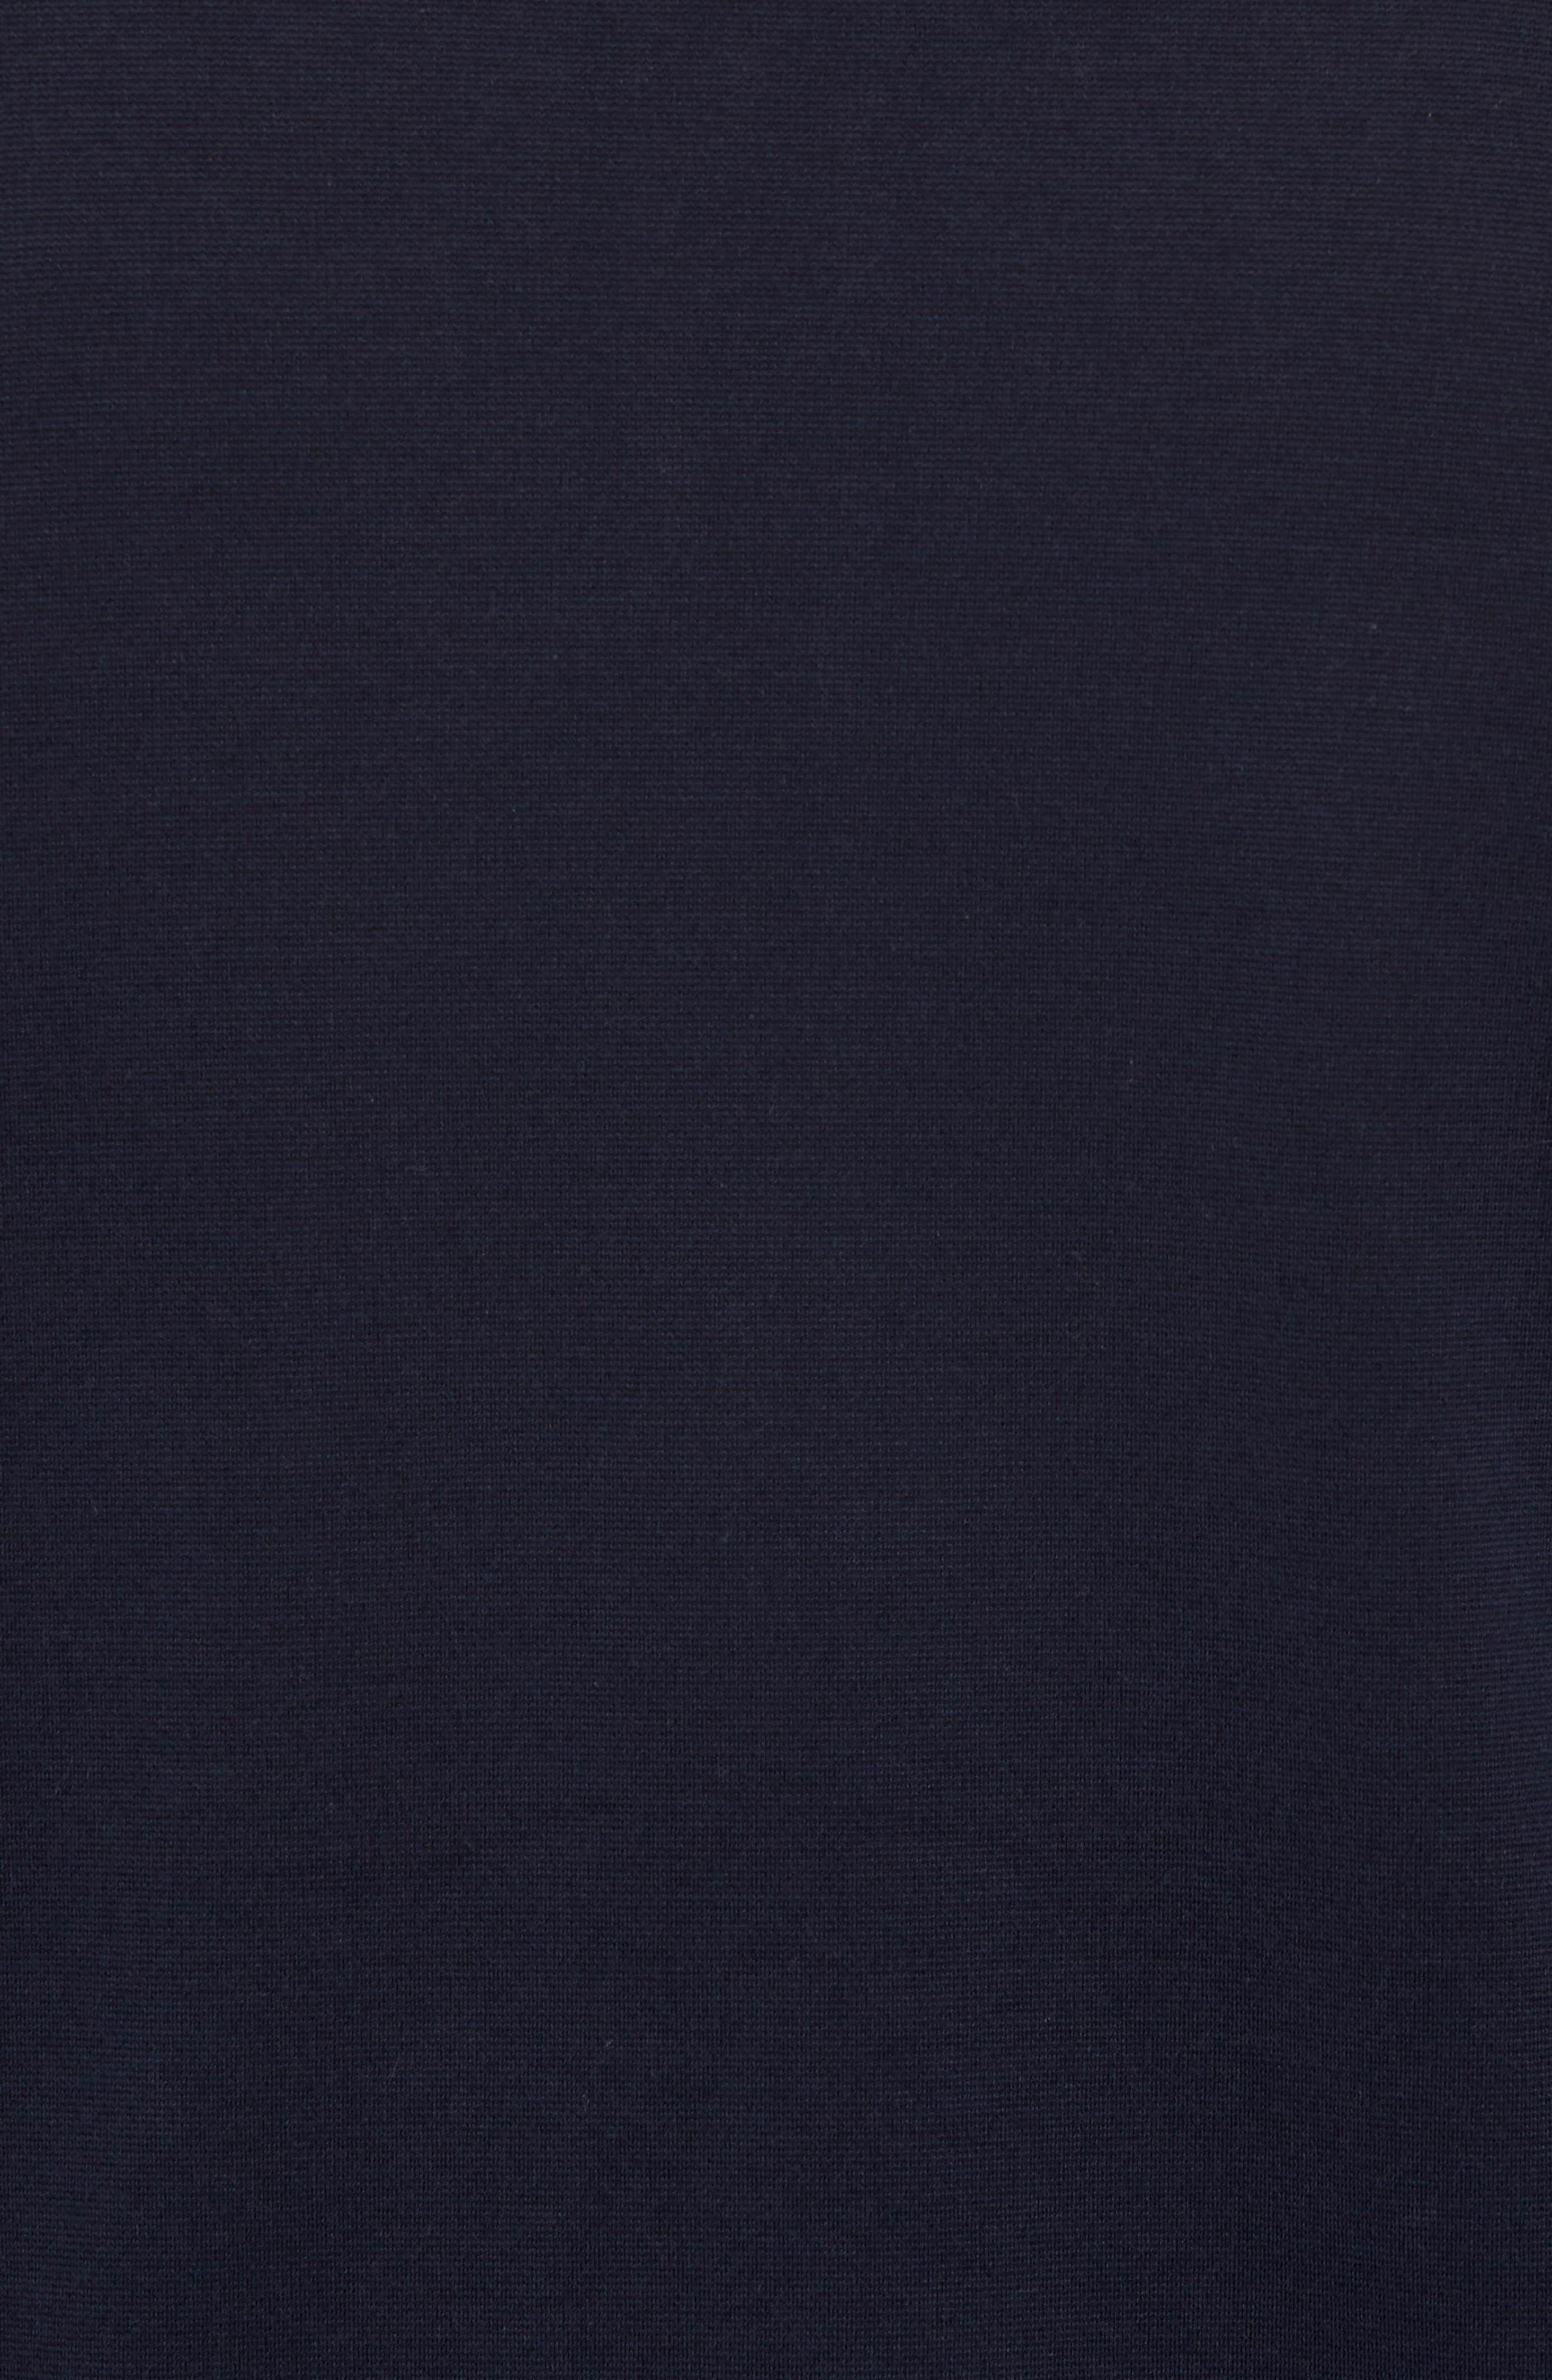 Fleece Jacket,                             Alternate thumbnail 5, color,                             Navy Night Black